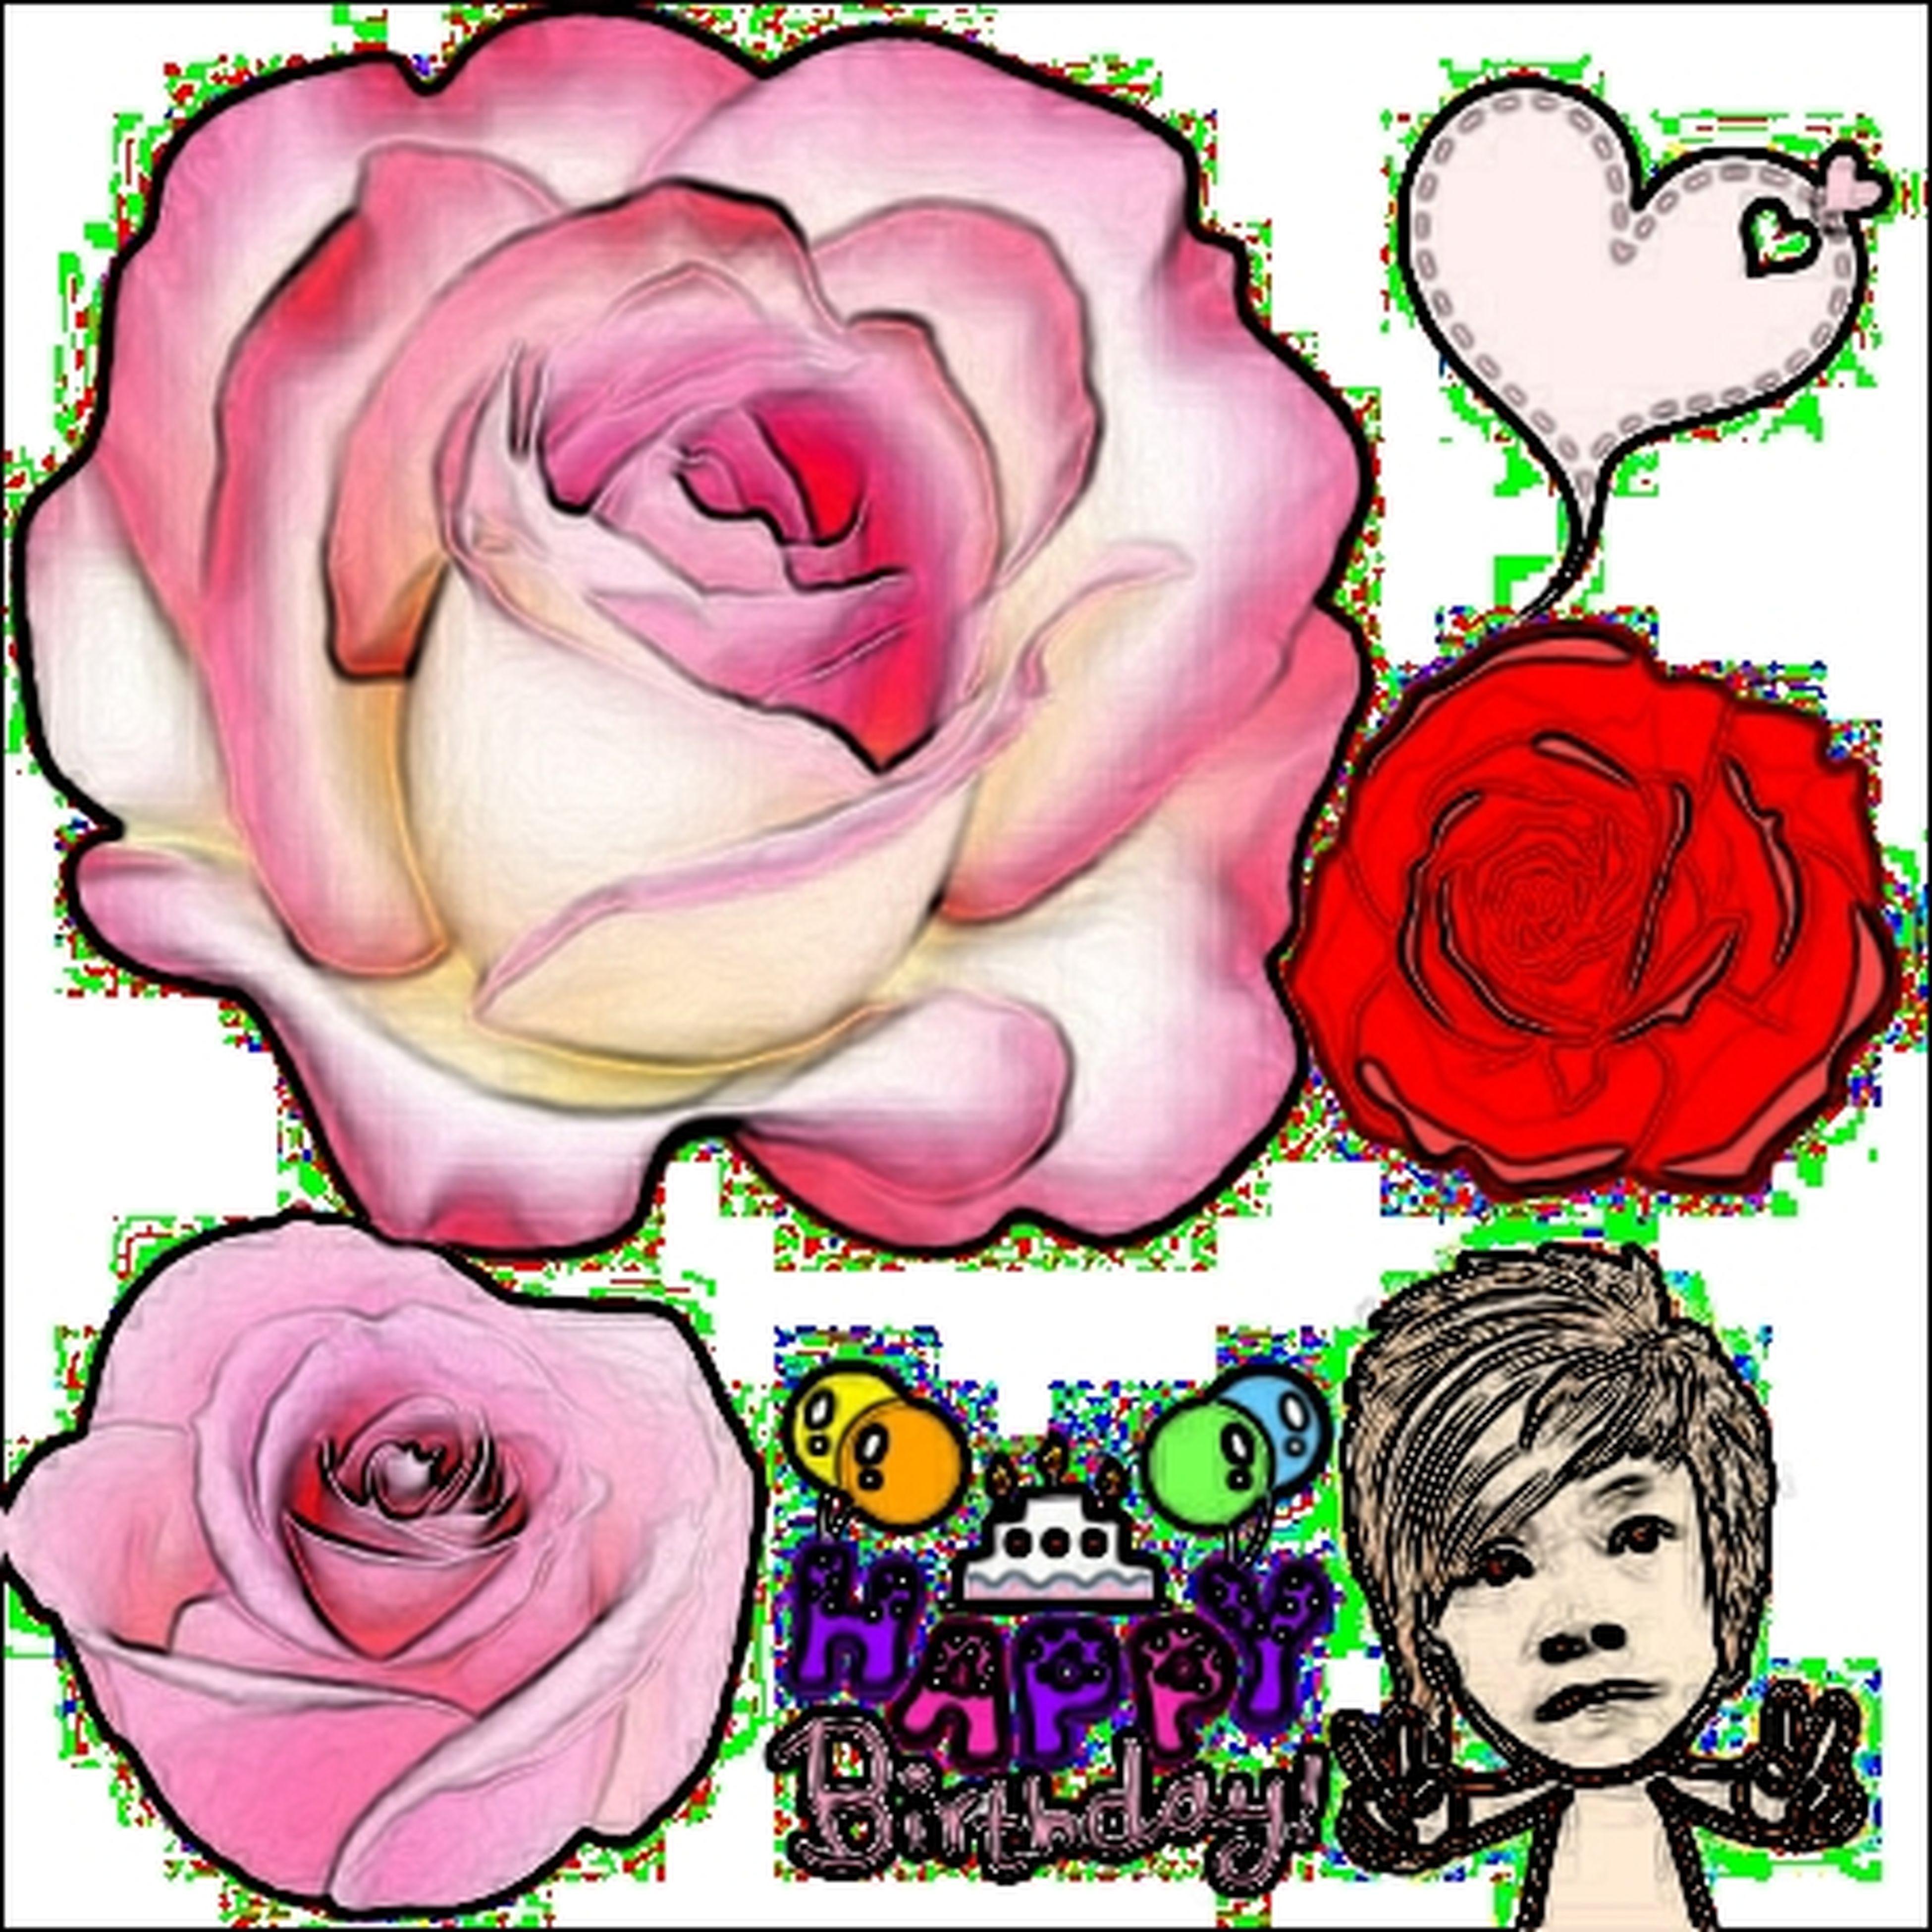 flower, art, art and craft, creativity, indoors, rose - flower, human representation, petal, close-up, pink color, flower head, rose, freshness, floral pattern, decoration, animal representation, fragility, design, bouquet